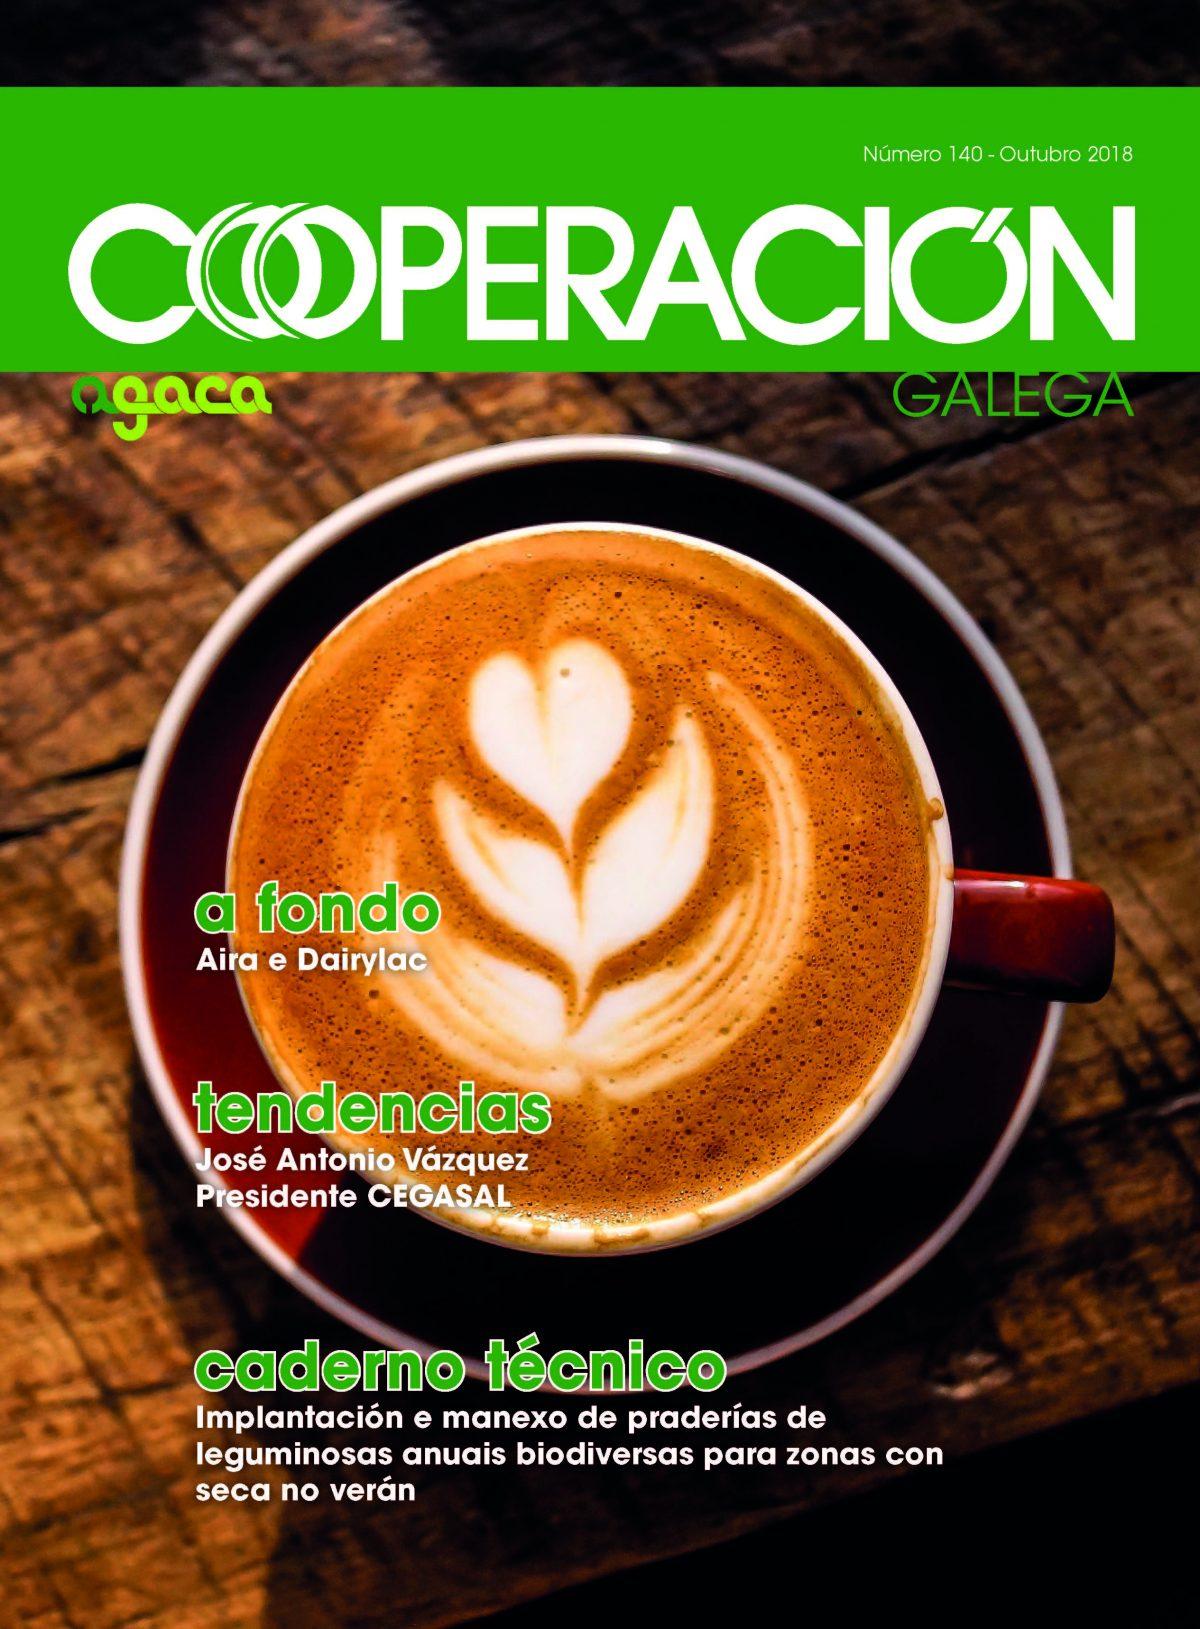 Cooperación Galega nº 140 – Octubre 2018